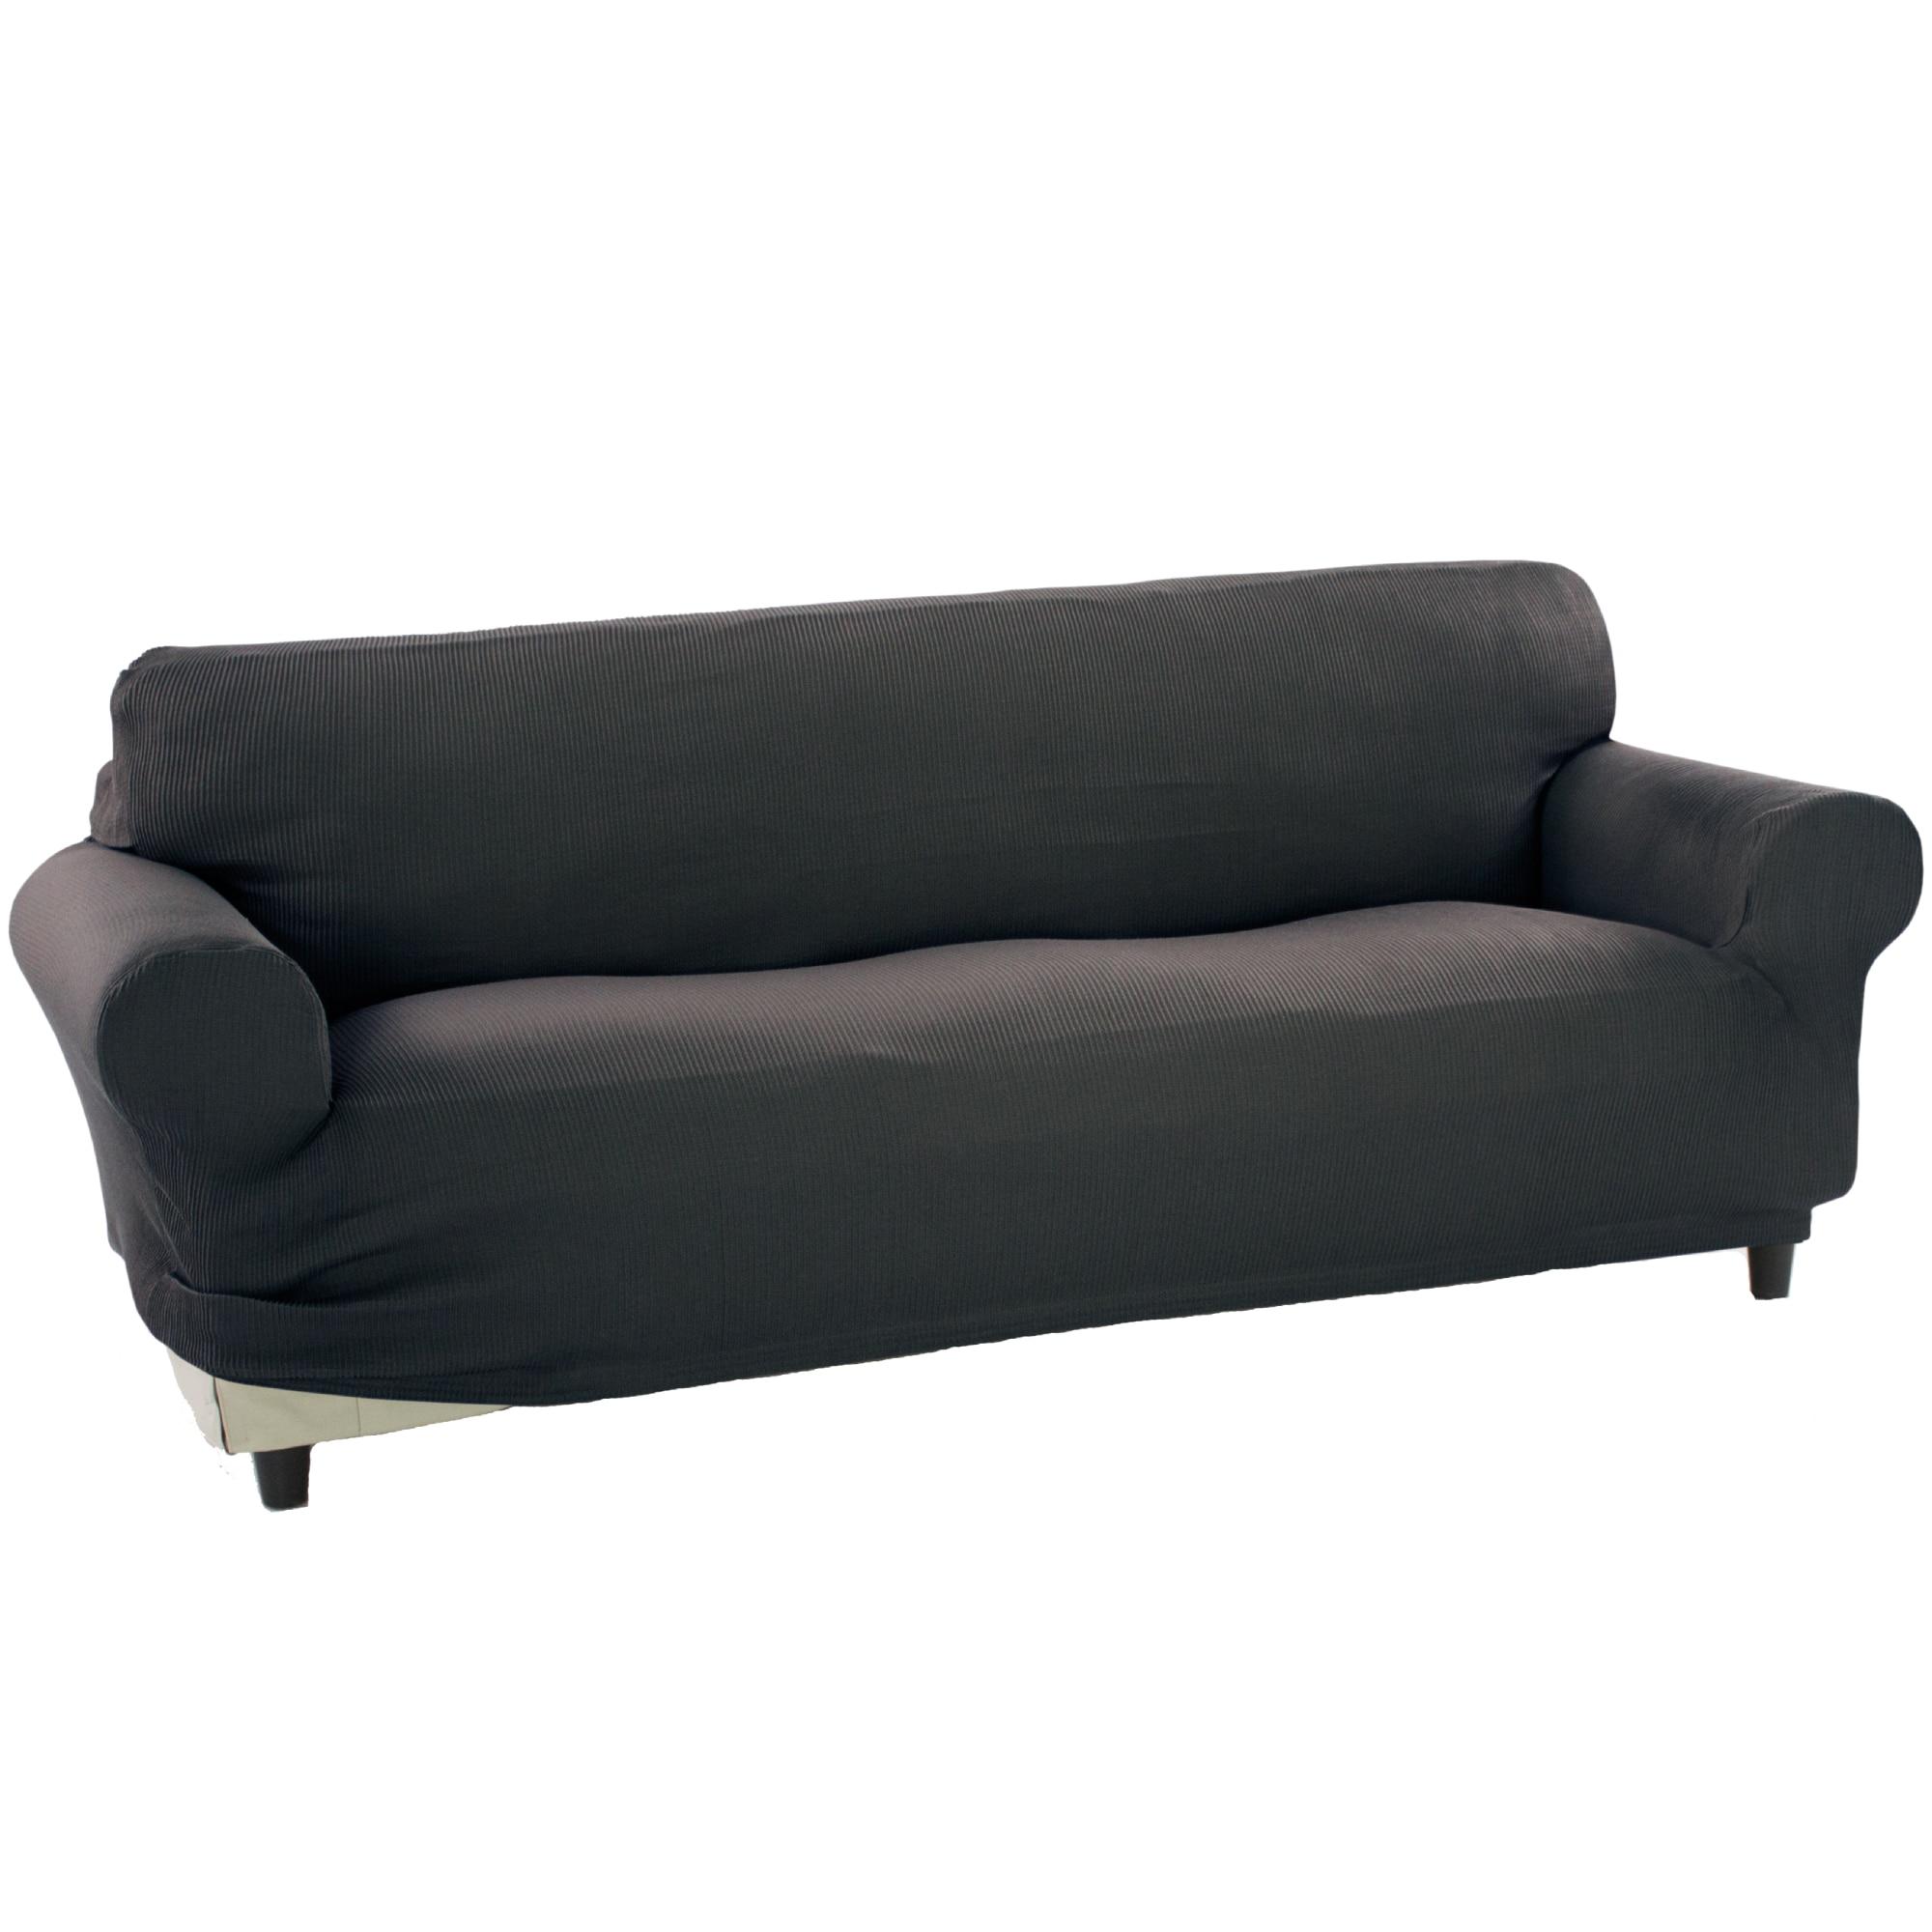 Fotografie Husa elastica pentru canapea 3 locuri Kring Nairobi, intre 180-220 cm, 60% bumbac+ 35% poliester + 5% elastan, Gri